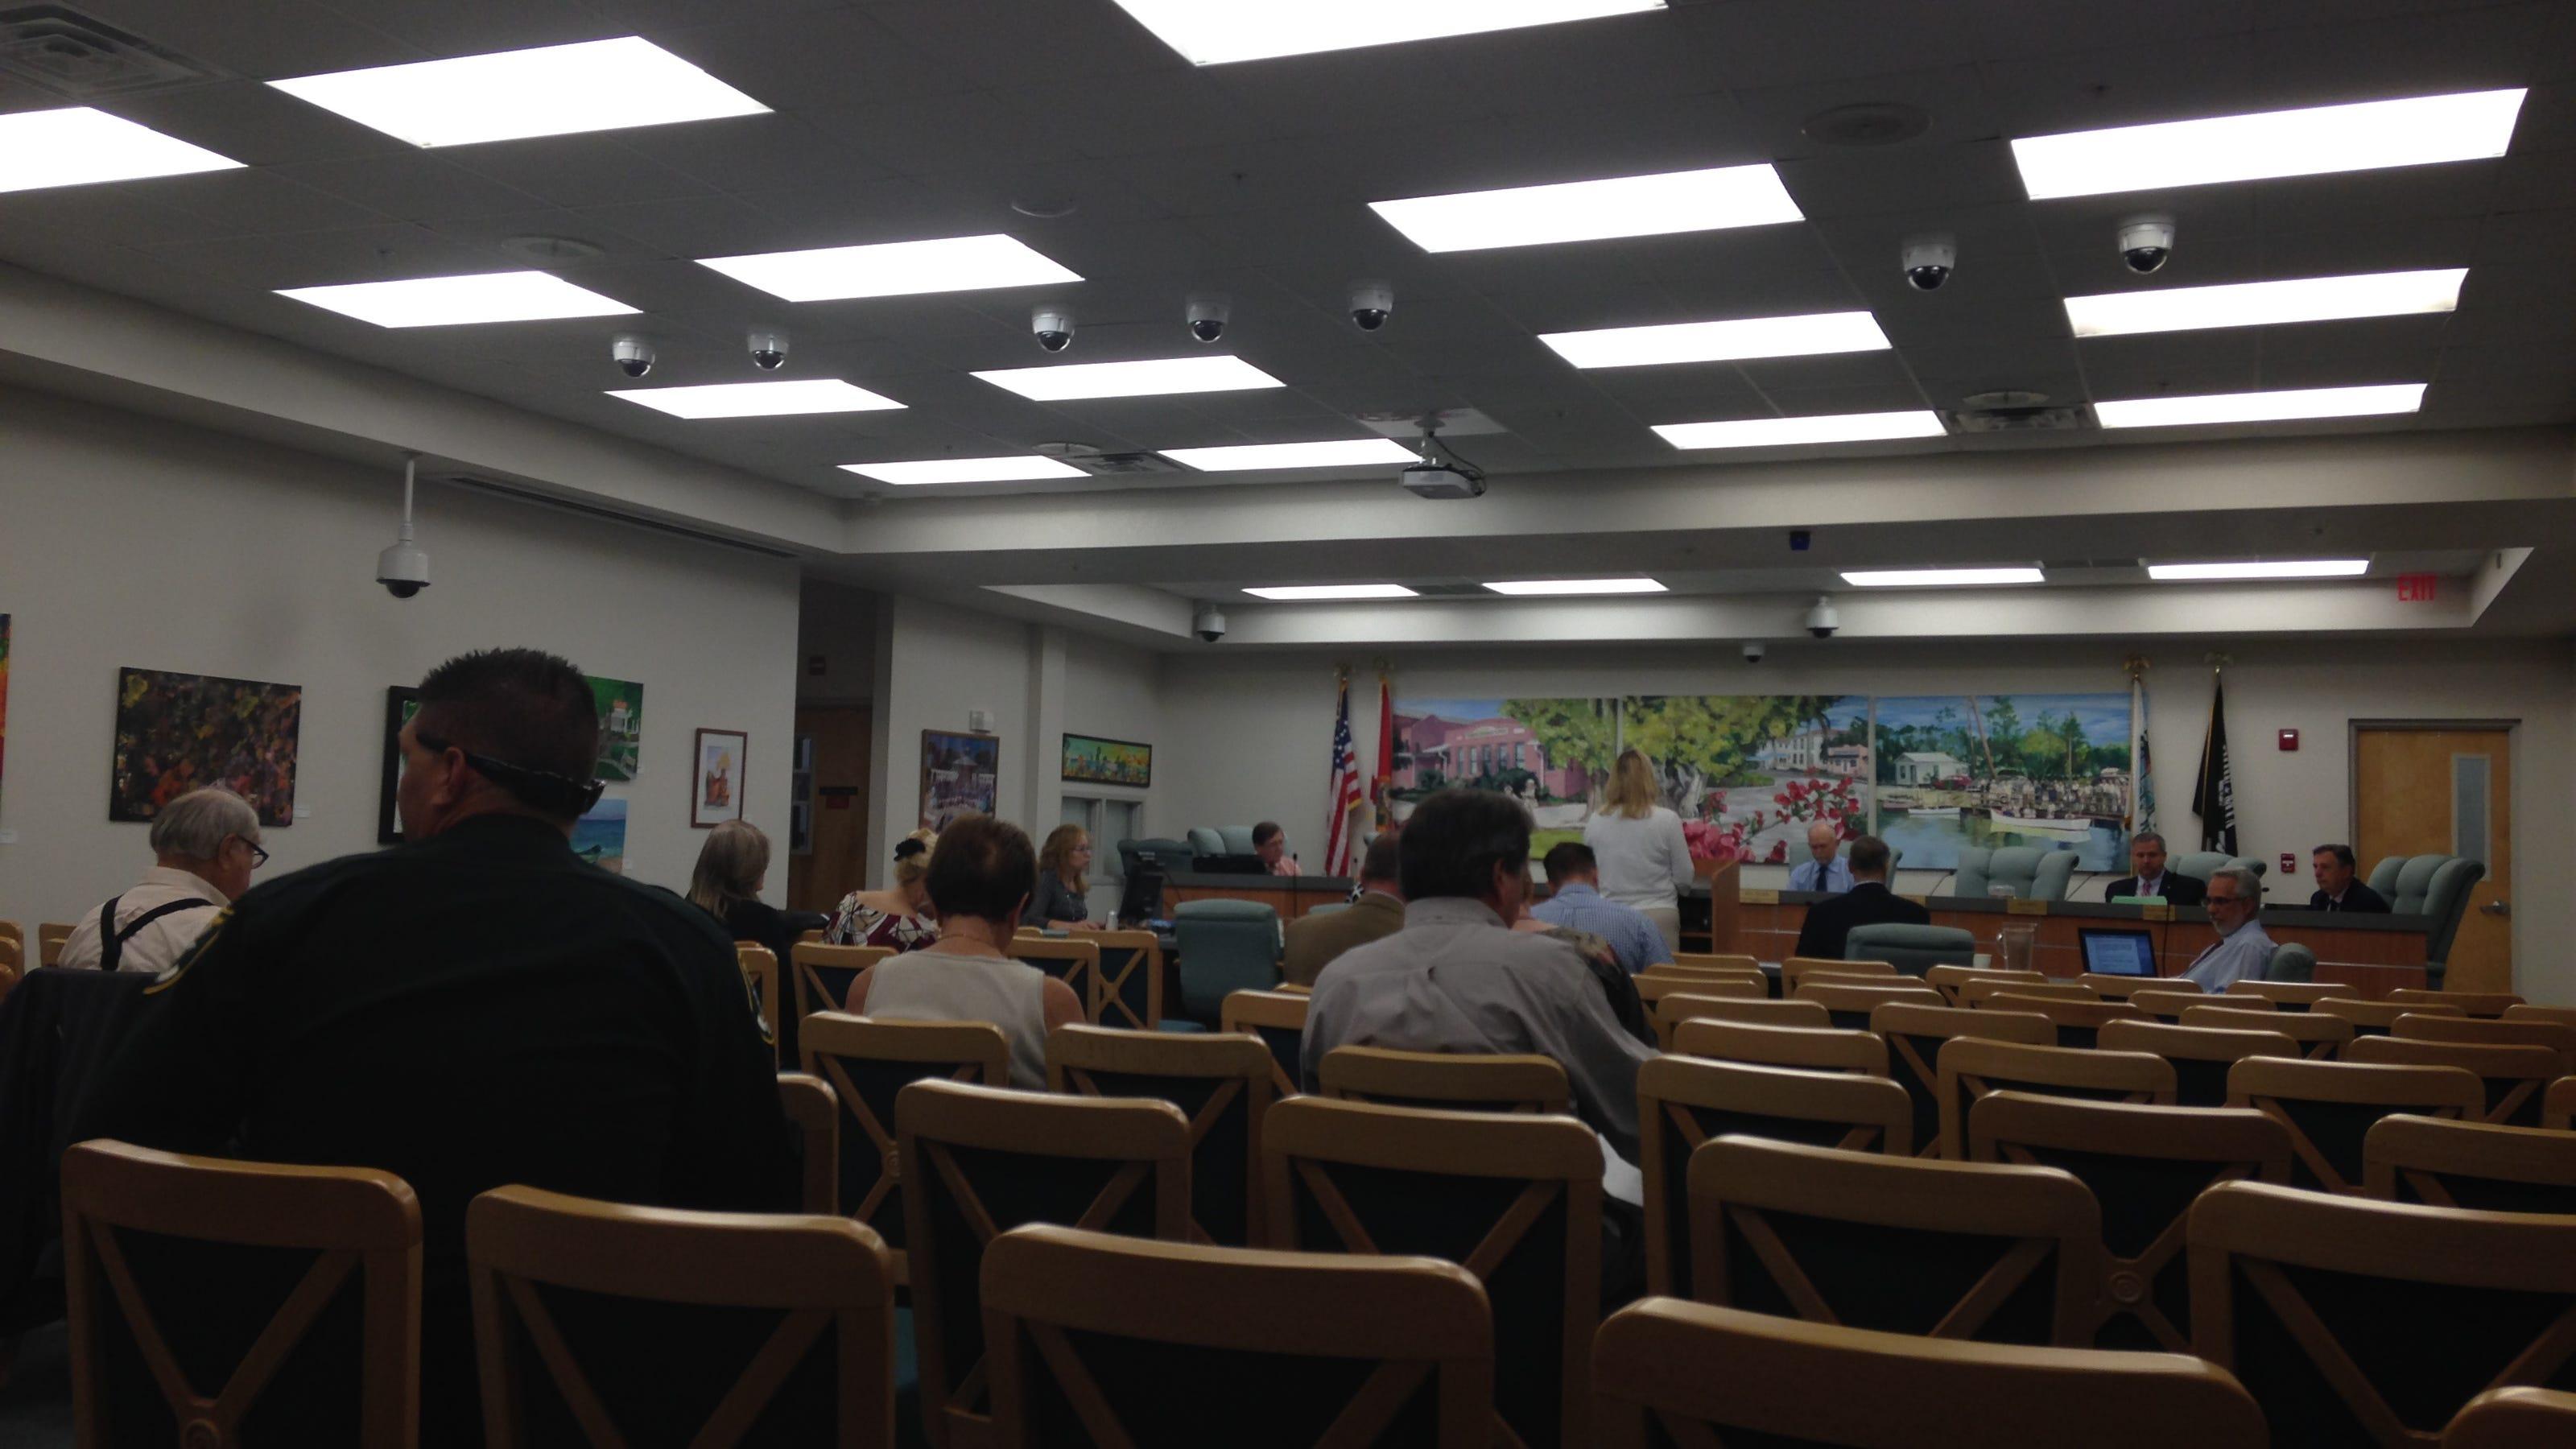 Bonita residents want high school disagree on location